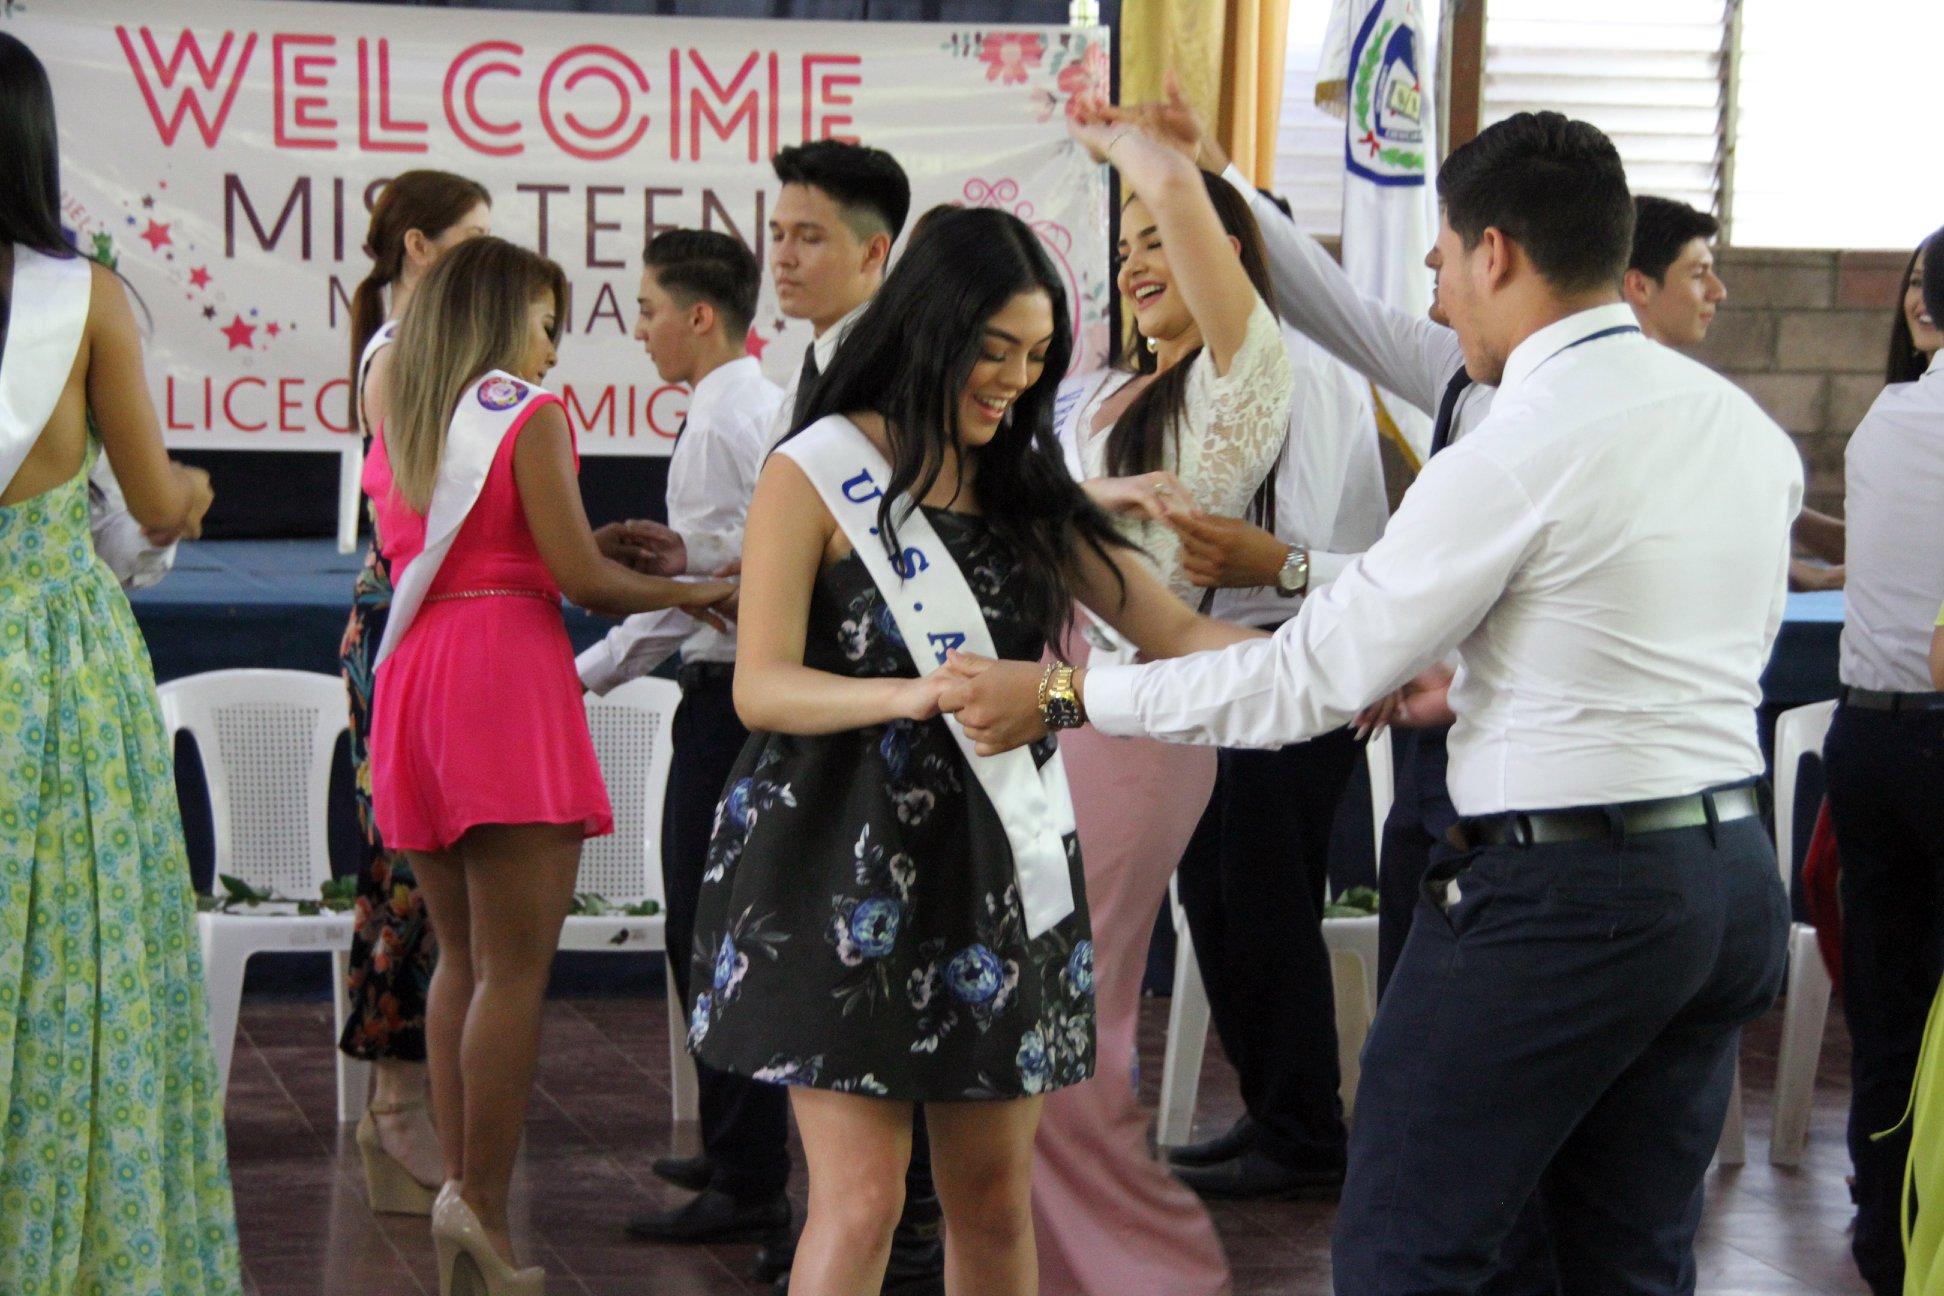 kristian de leon, miss teen mundial usa 2019/top 16 de teen universe 2018. - Página 8 61222110